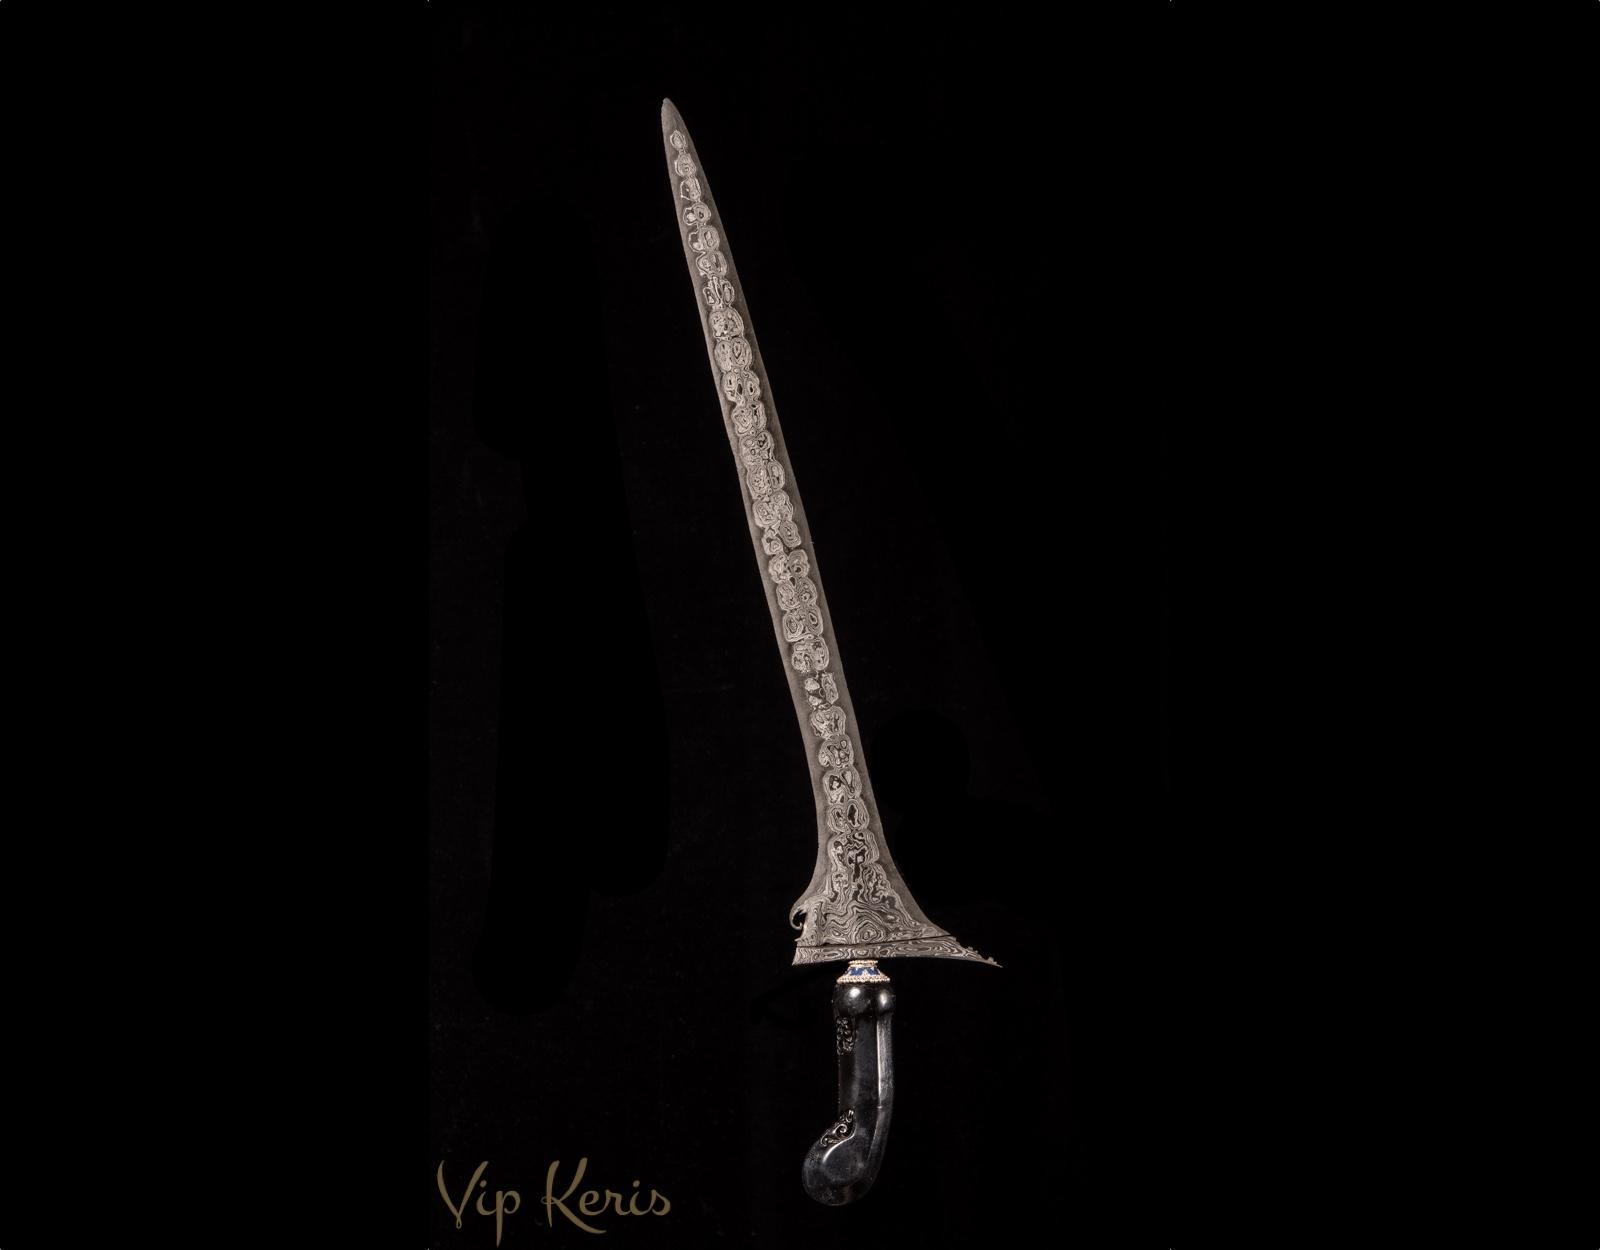 Кинжал Крис Tilam, 15 аркан фото VipKeris